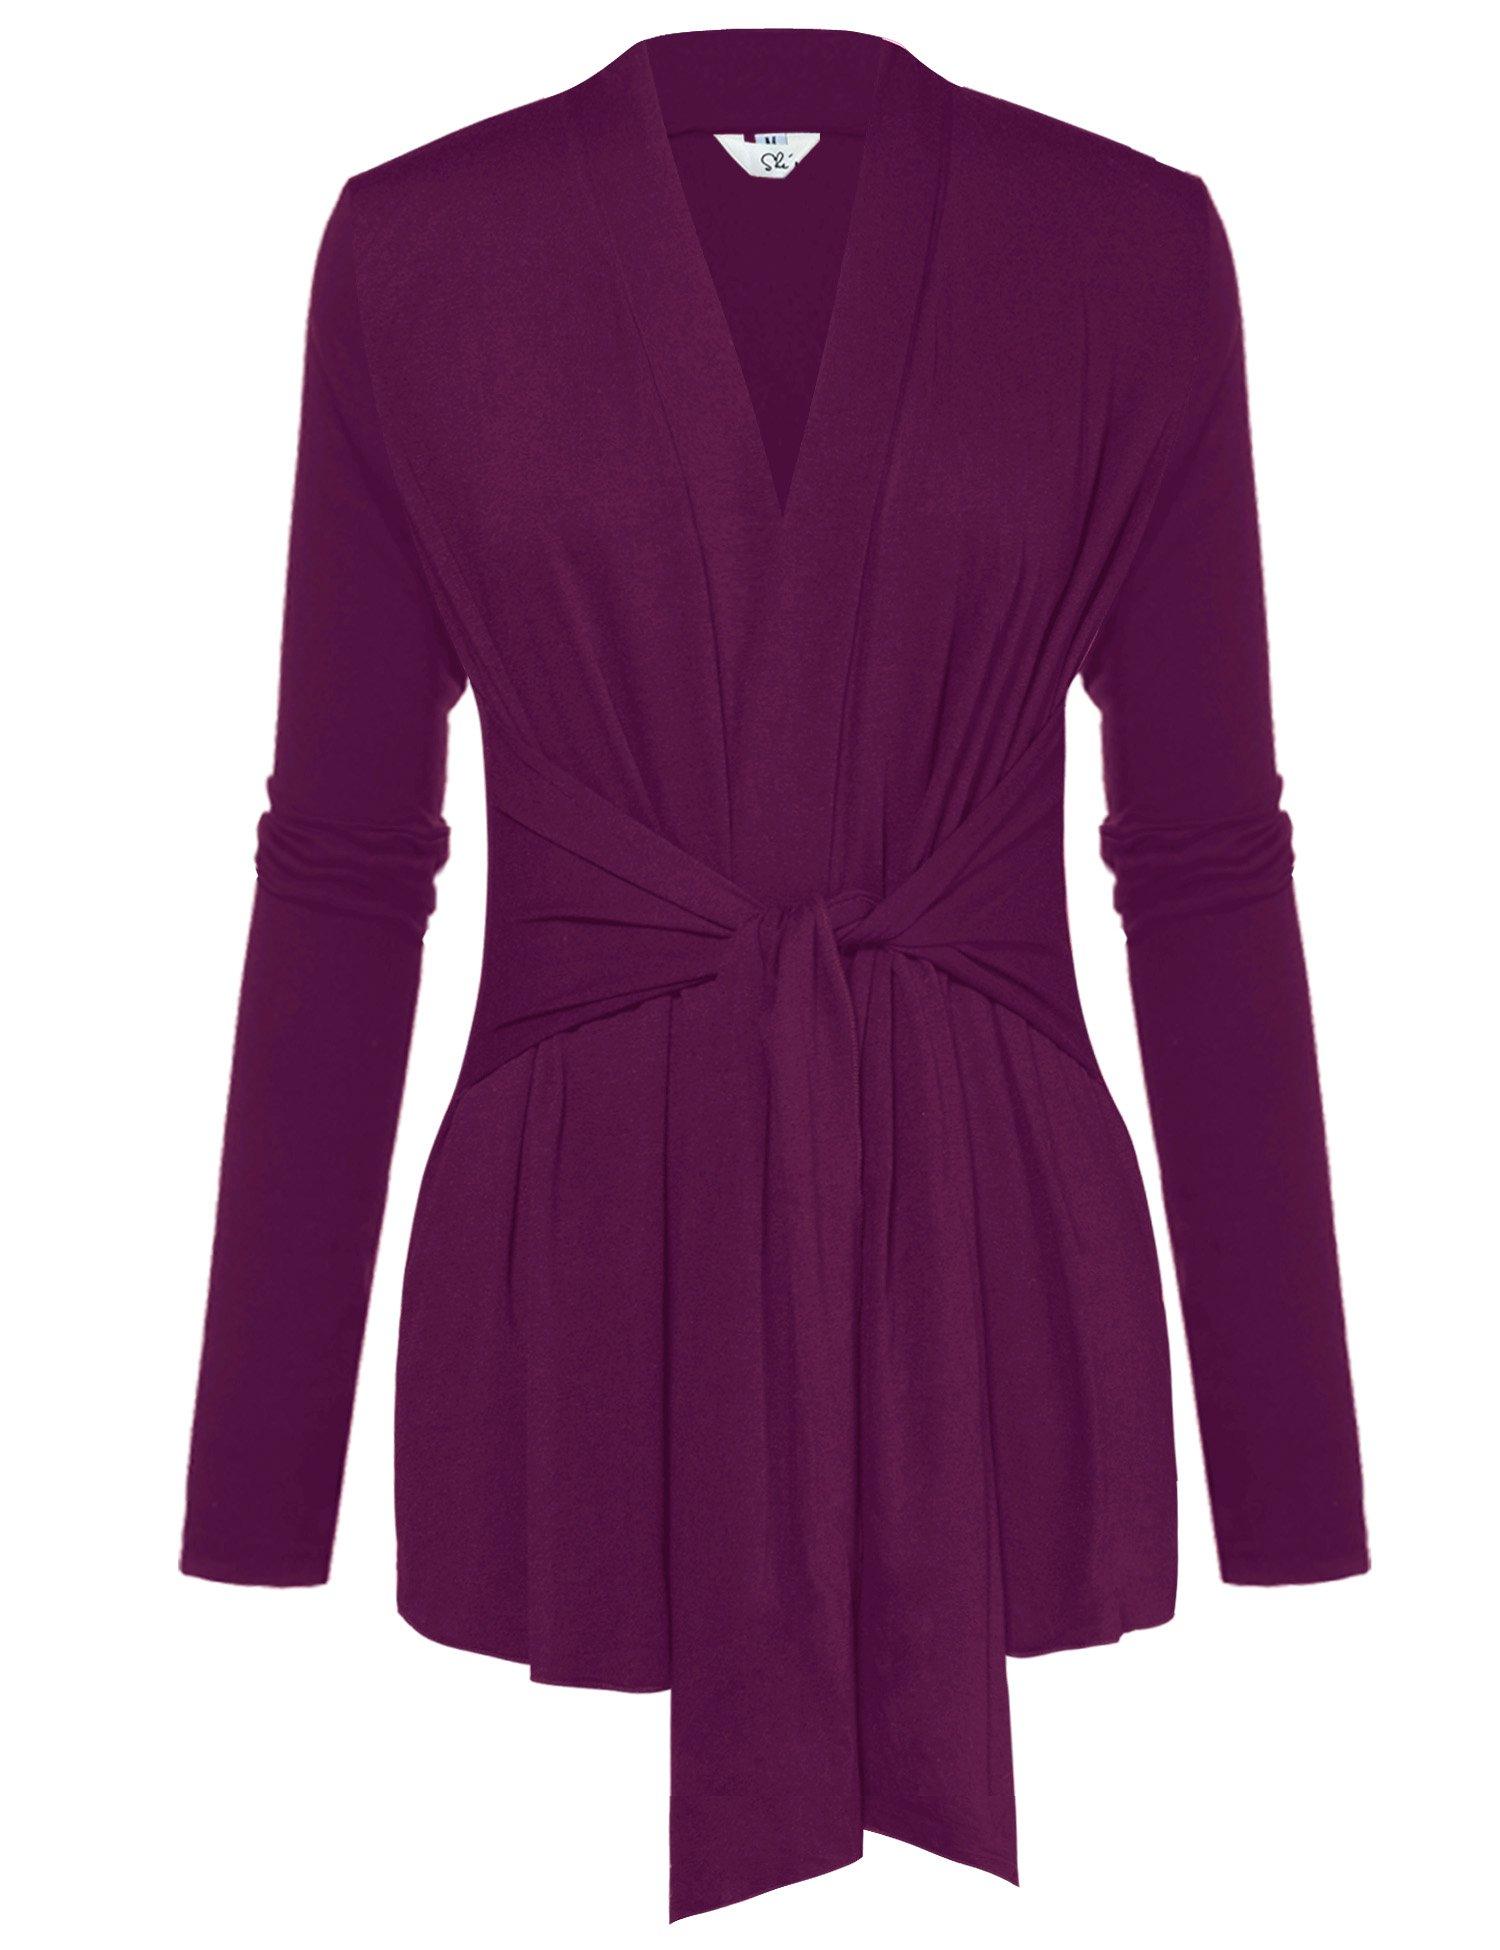 A Blues Man Womens Casual Long Sleeve Open Front Drape Wrap Travel Cardigan Sweater Purple M